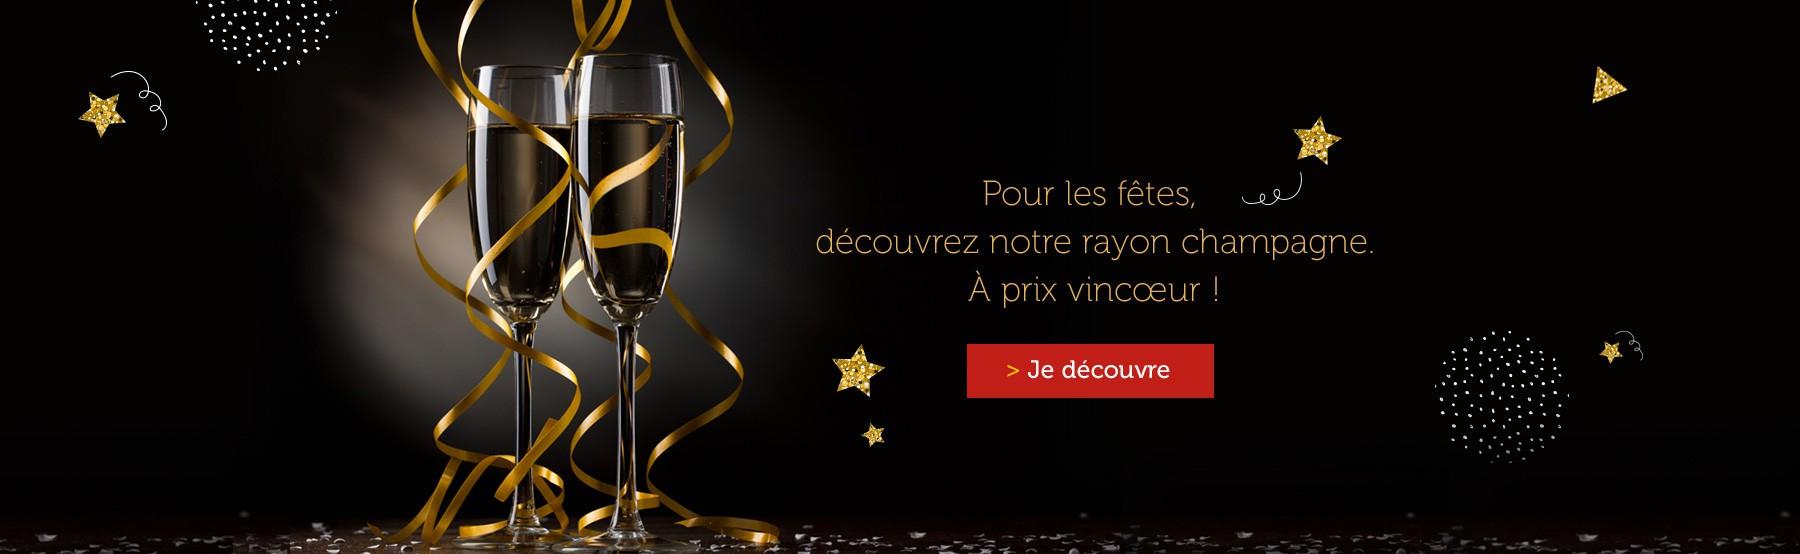 Champagne Vincoeur